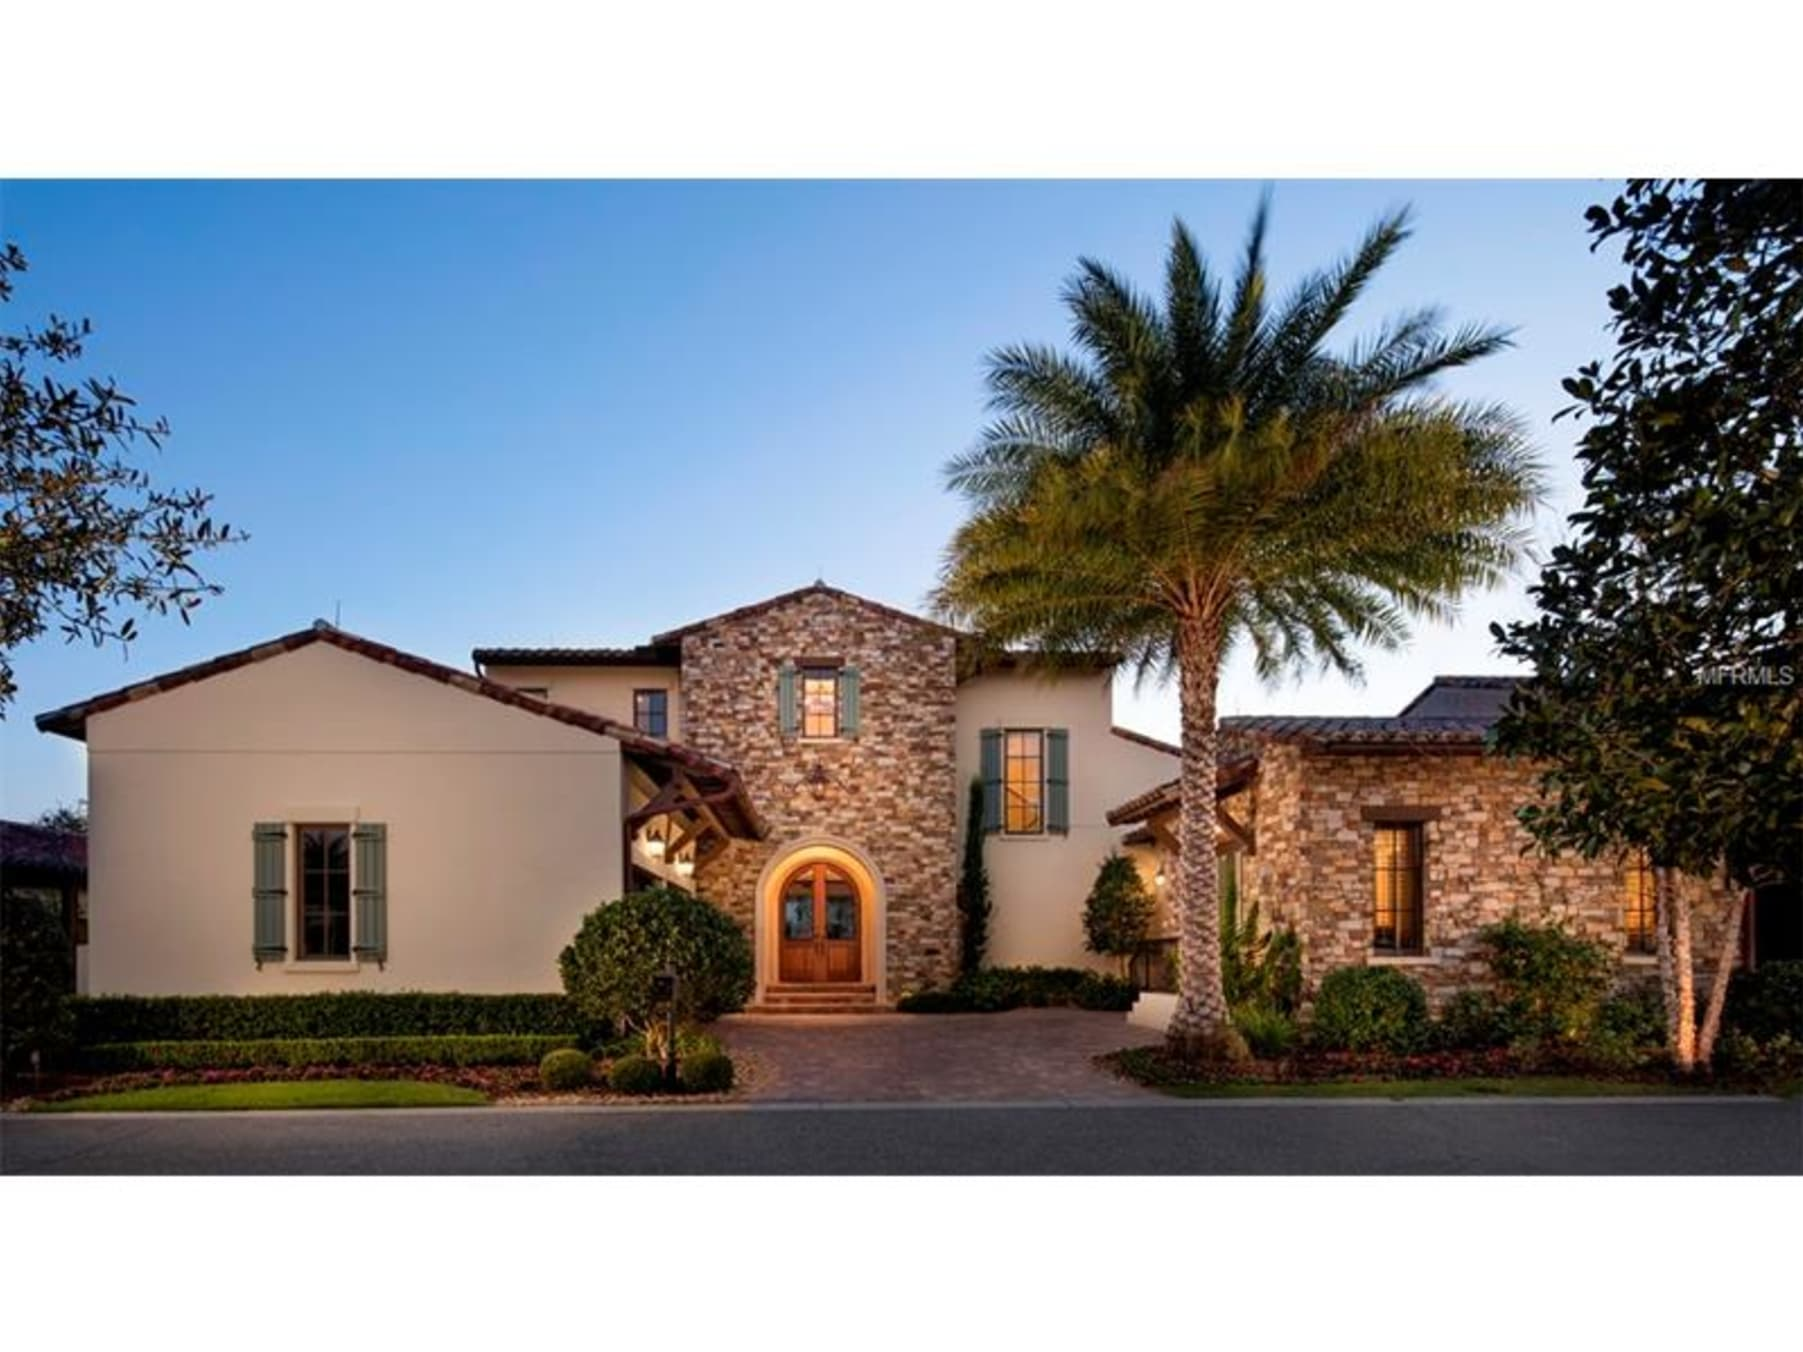 Luxury Homes Estates Winter Garden Windermere Dr Phillips Golden Oak ...